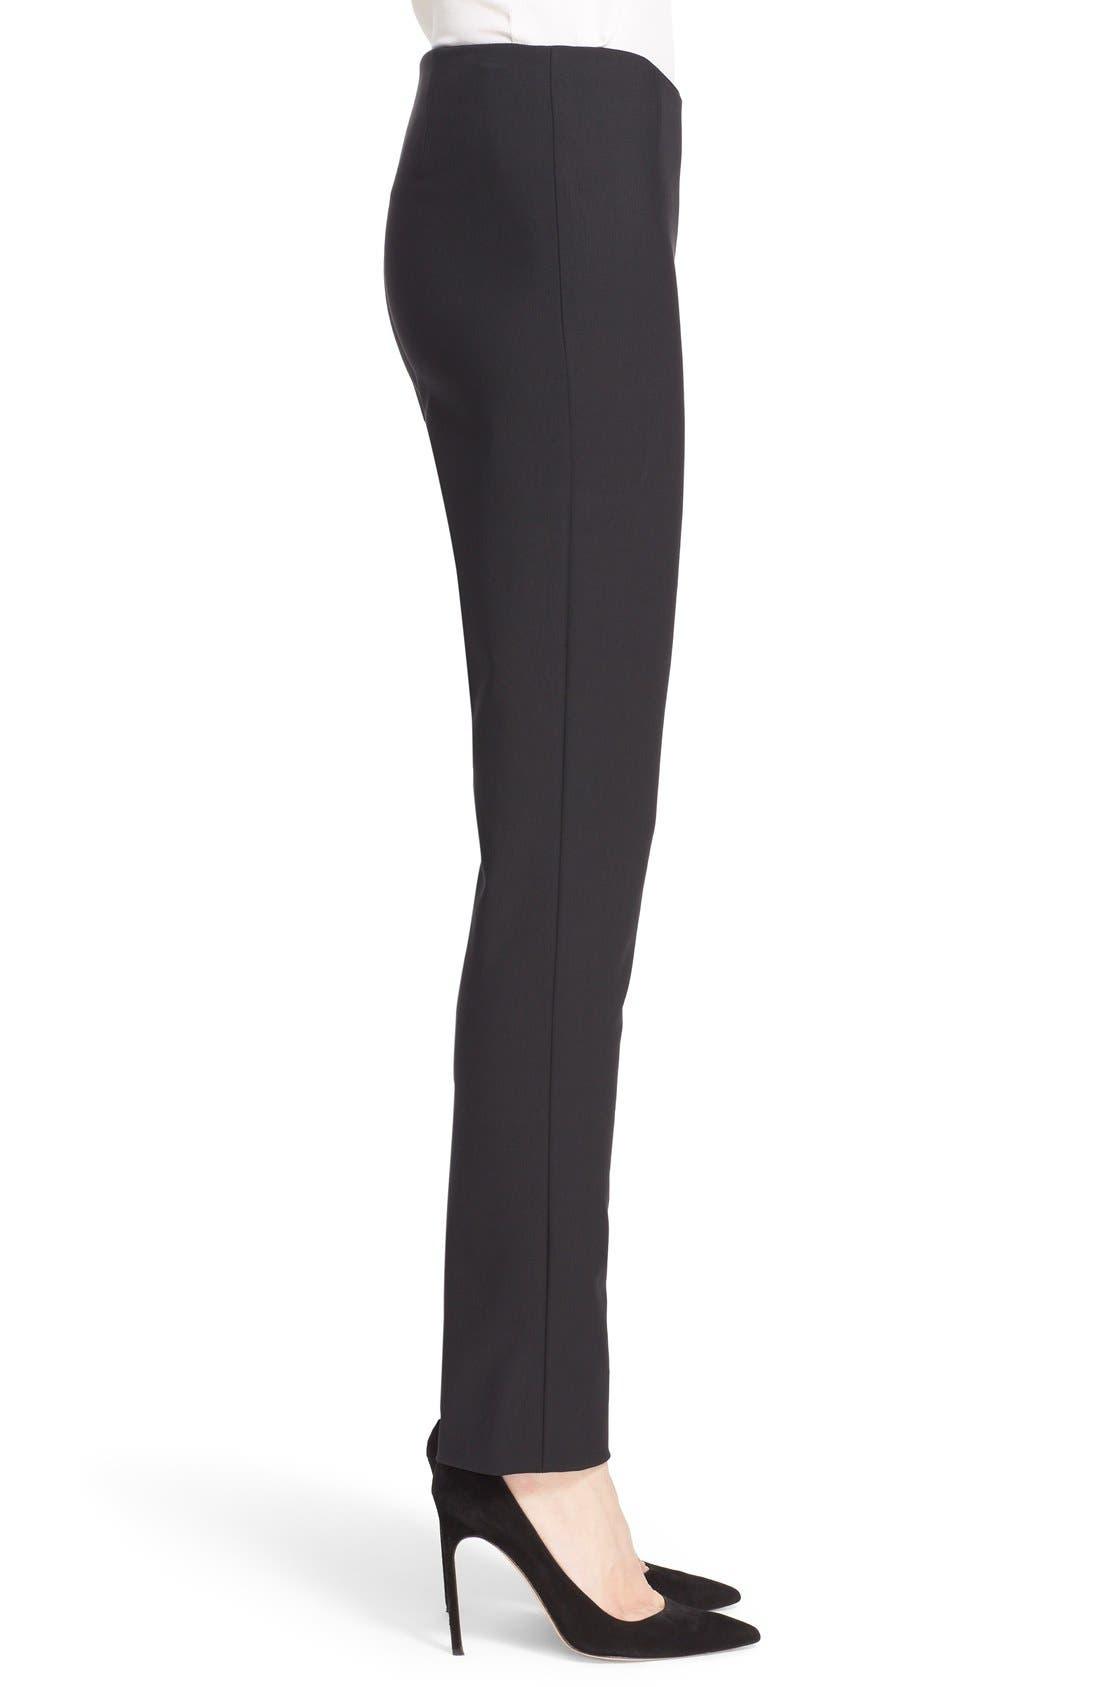 LELA ROSE,                             'Catherine' Stretch Twill Ankle Pants,                             Alternate thumbnail 12, color,                             BLACK